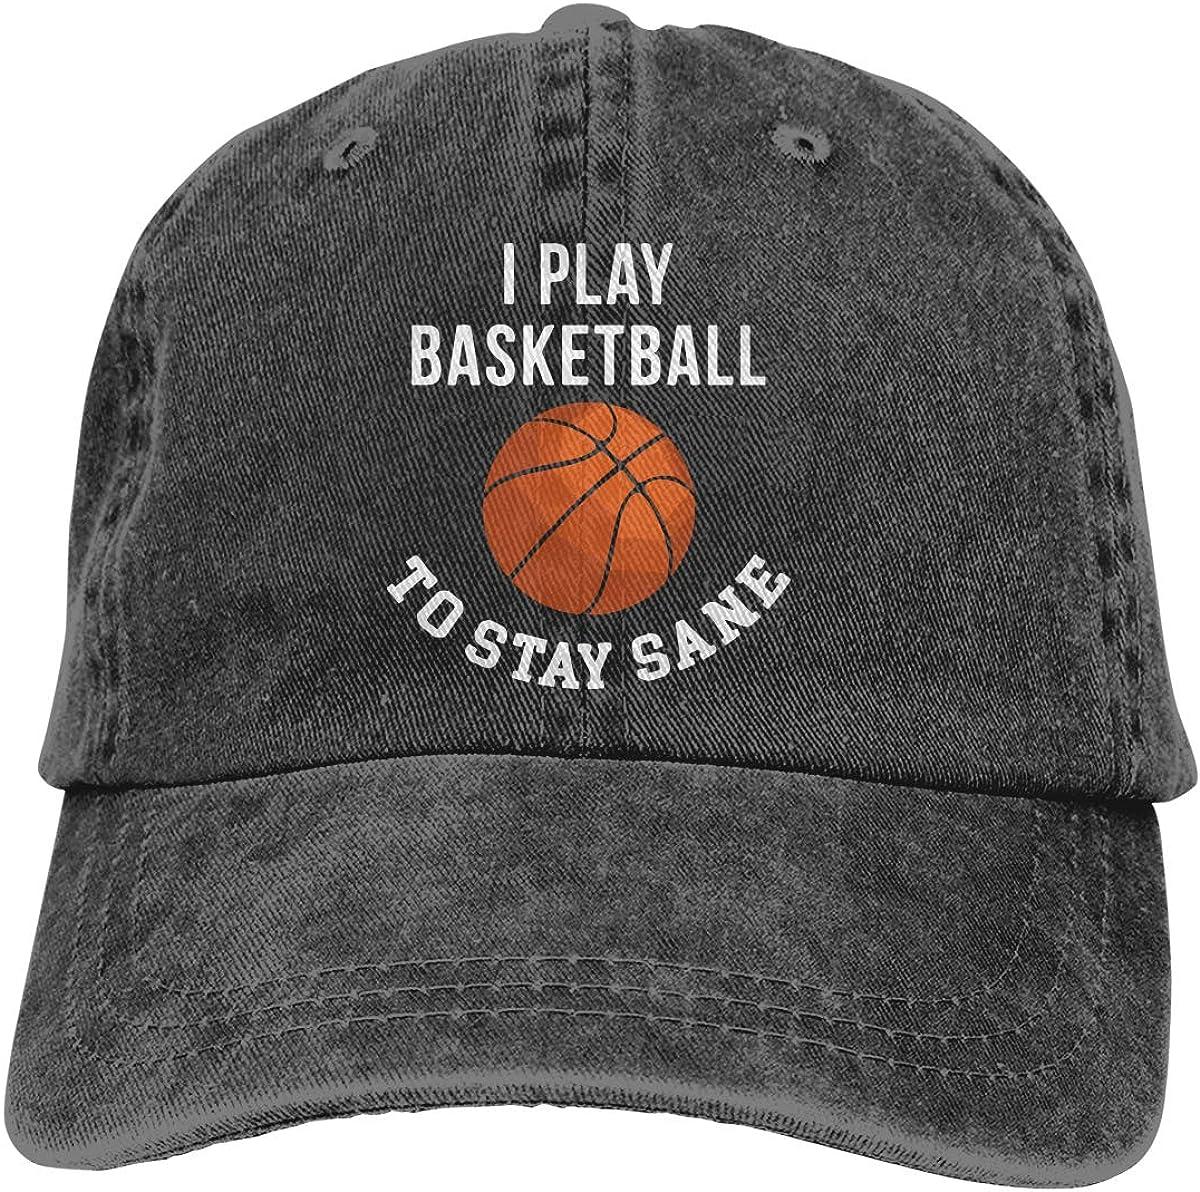 I Play Basketball to Stay Sane Adult Trendy Cowboy Sun Hat Adjustable Baseball Cap